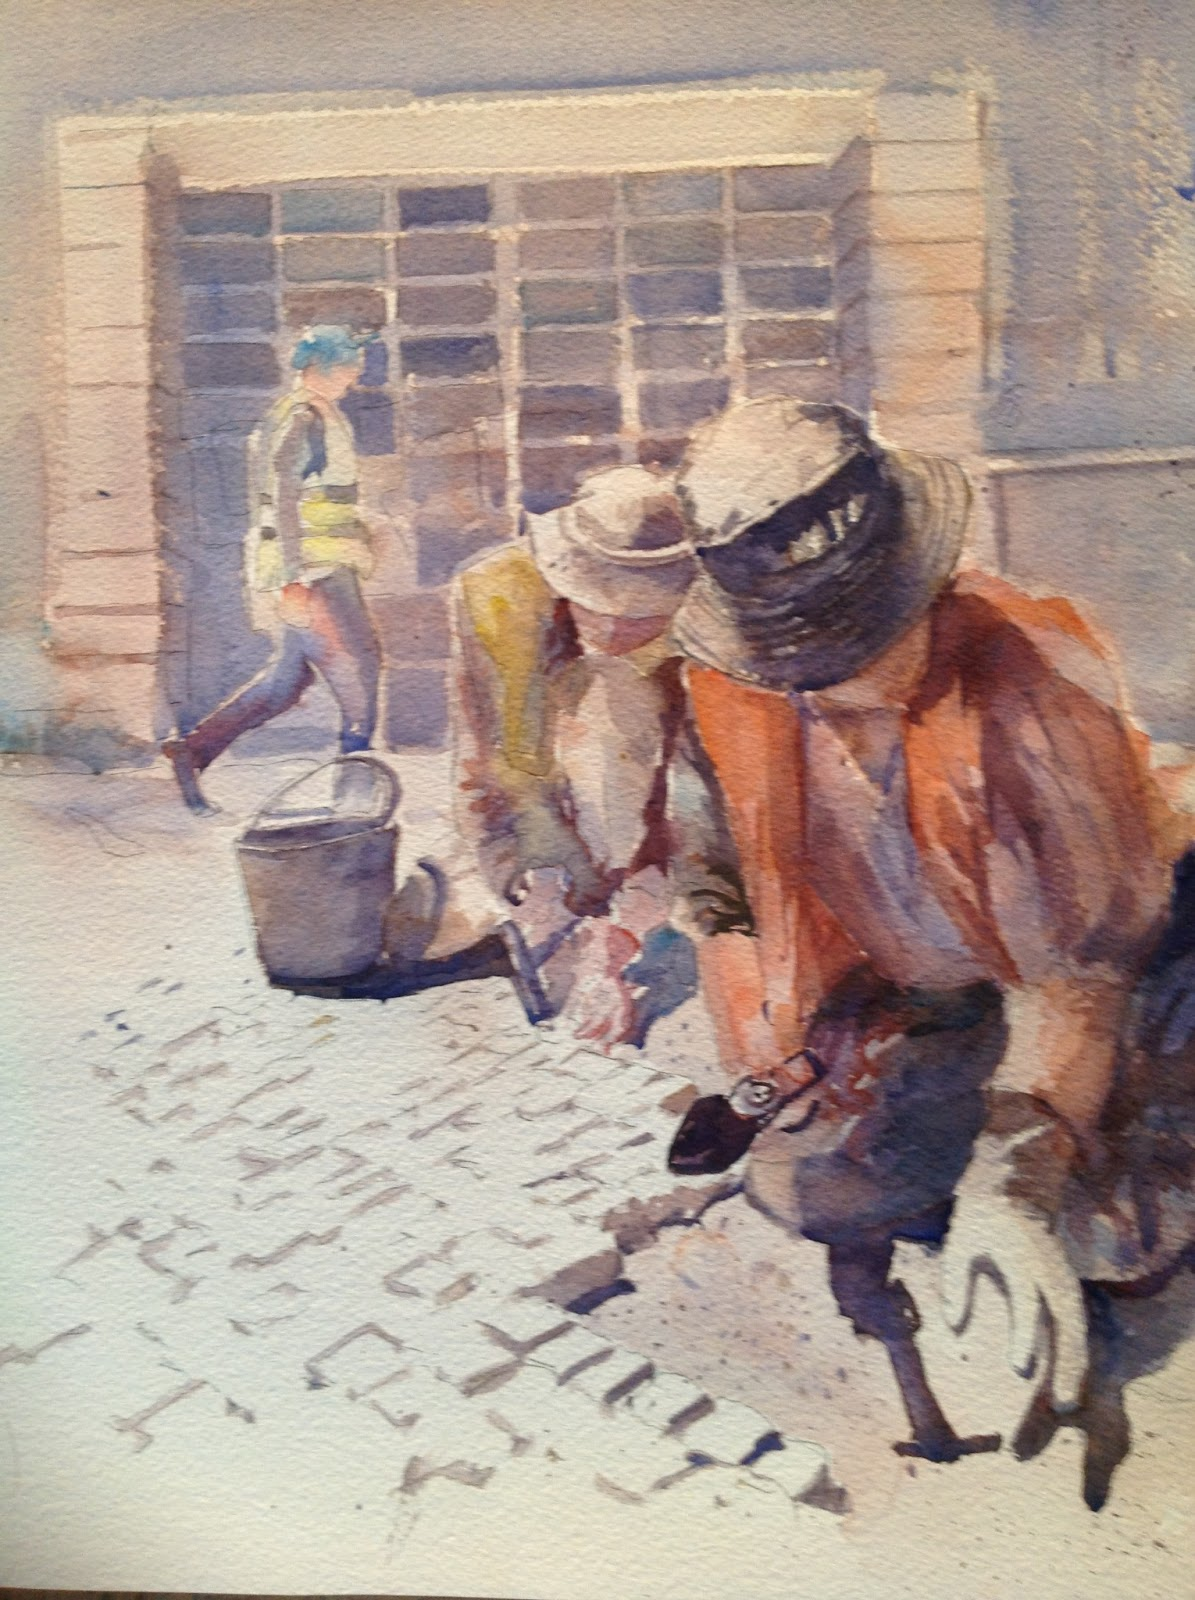 caldas da rainha hindu personals Caldas da rainha, leiria, portugal industry construction current: valis sa piping duct fabrication we are hiring personals and antónio capitaz shared photo.